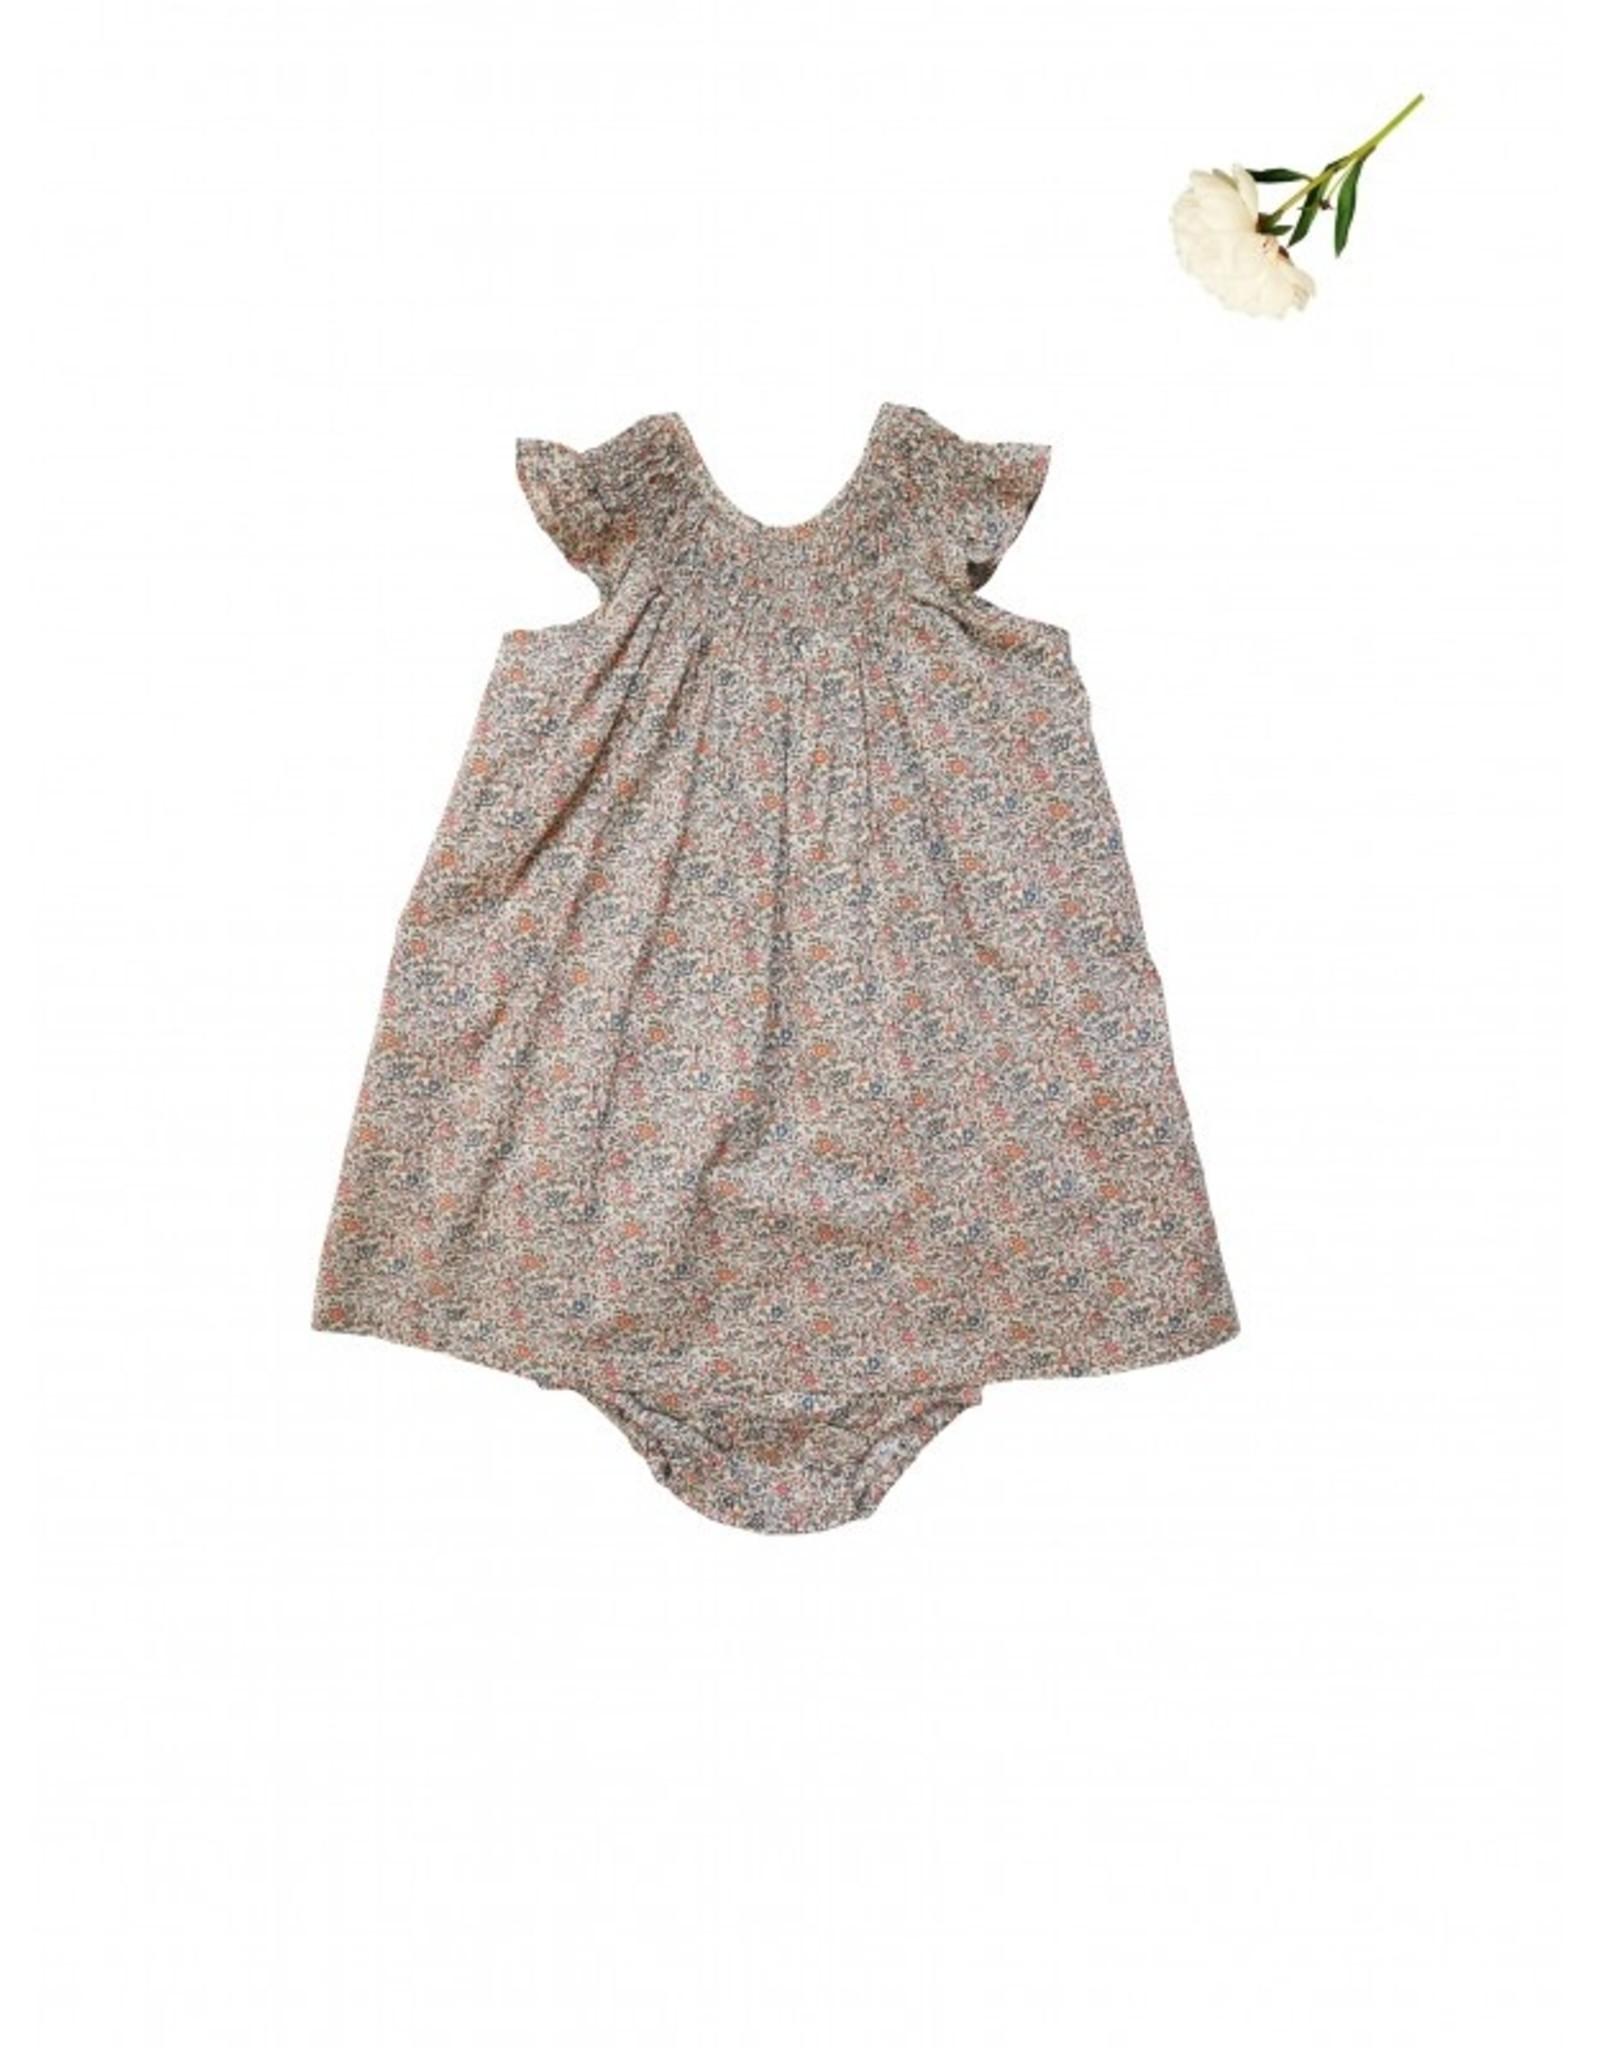 La Petite Collection Liberty Katie & Millie Gathered Dress